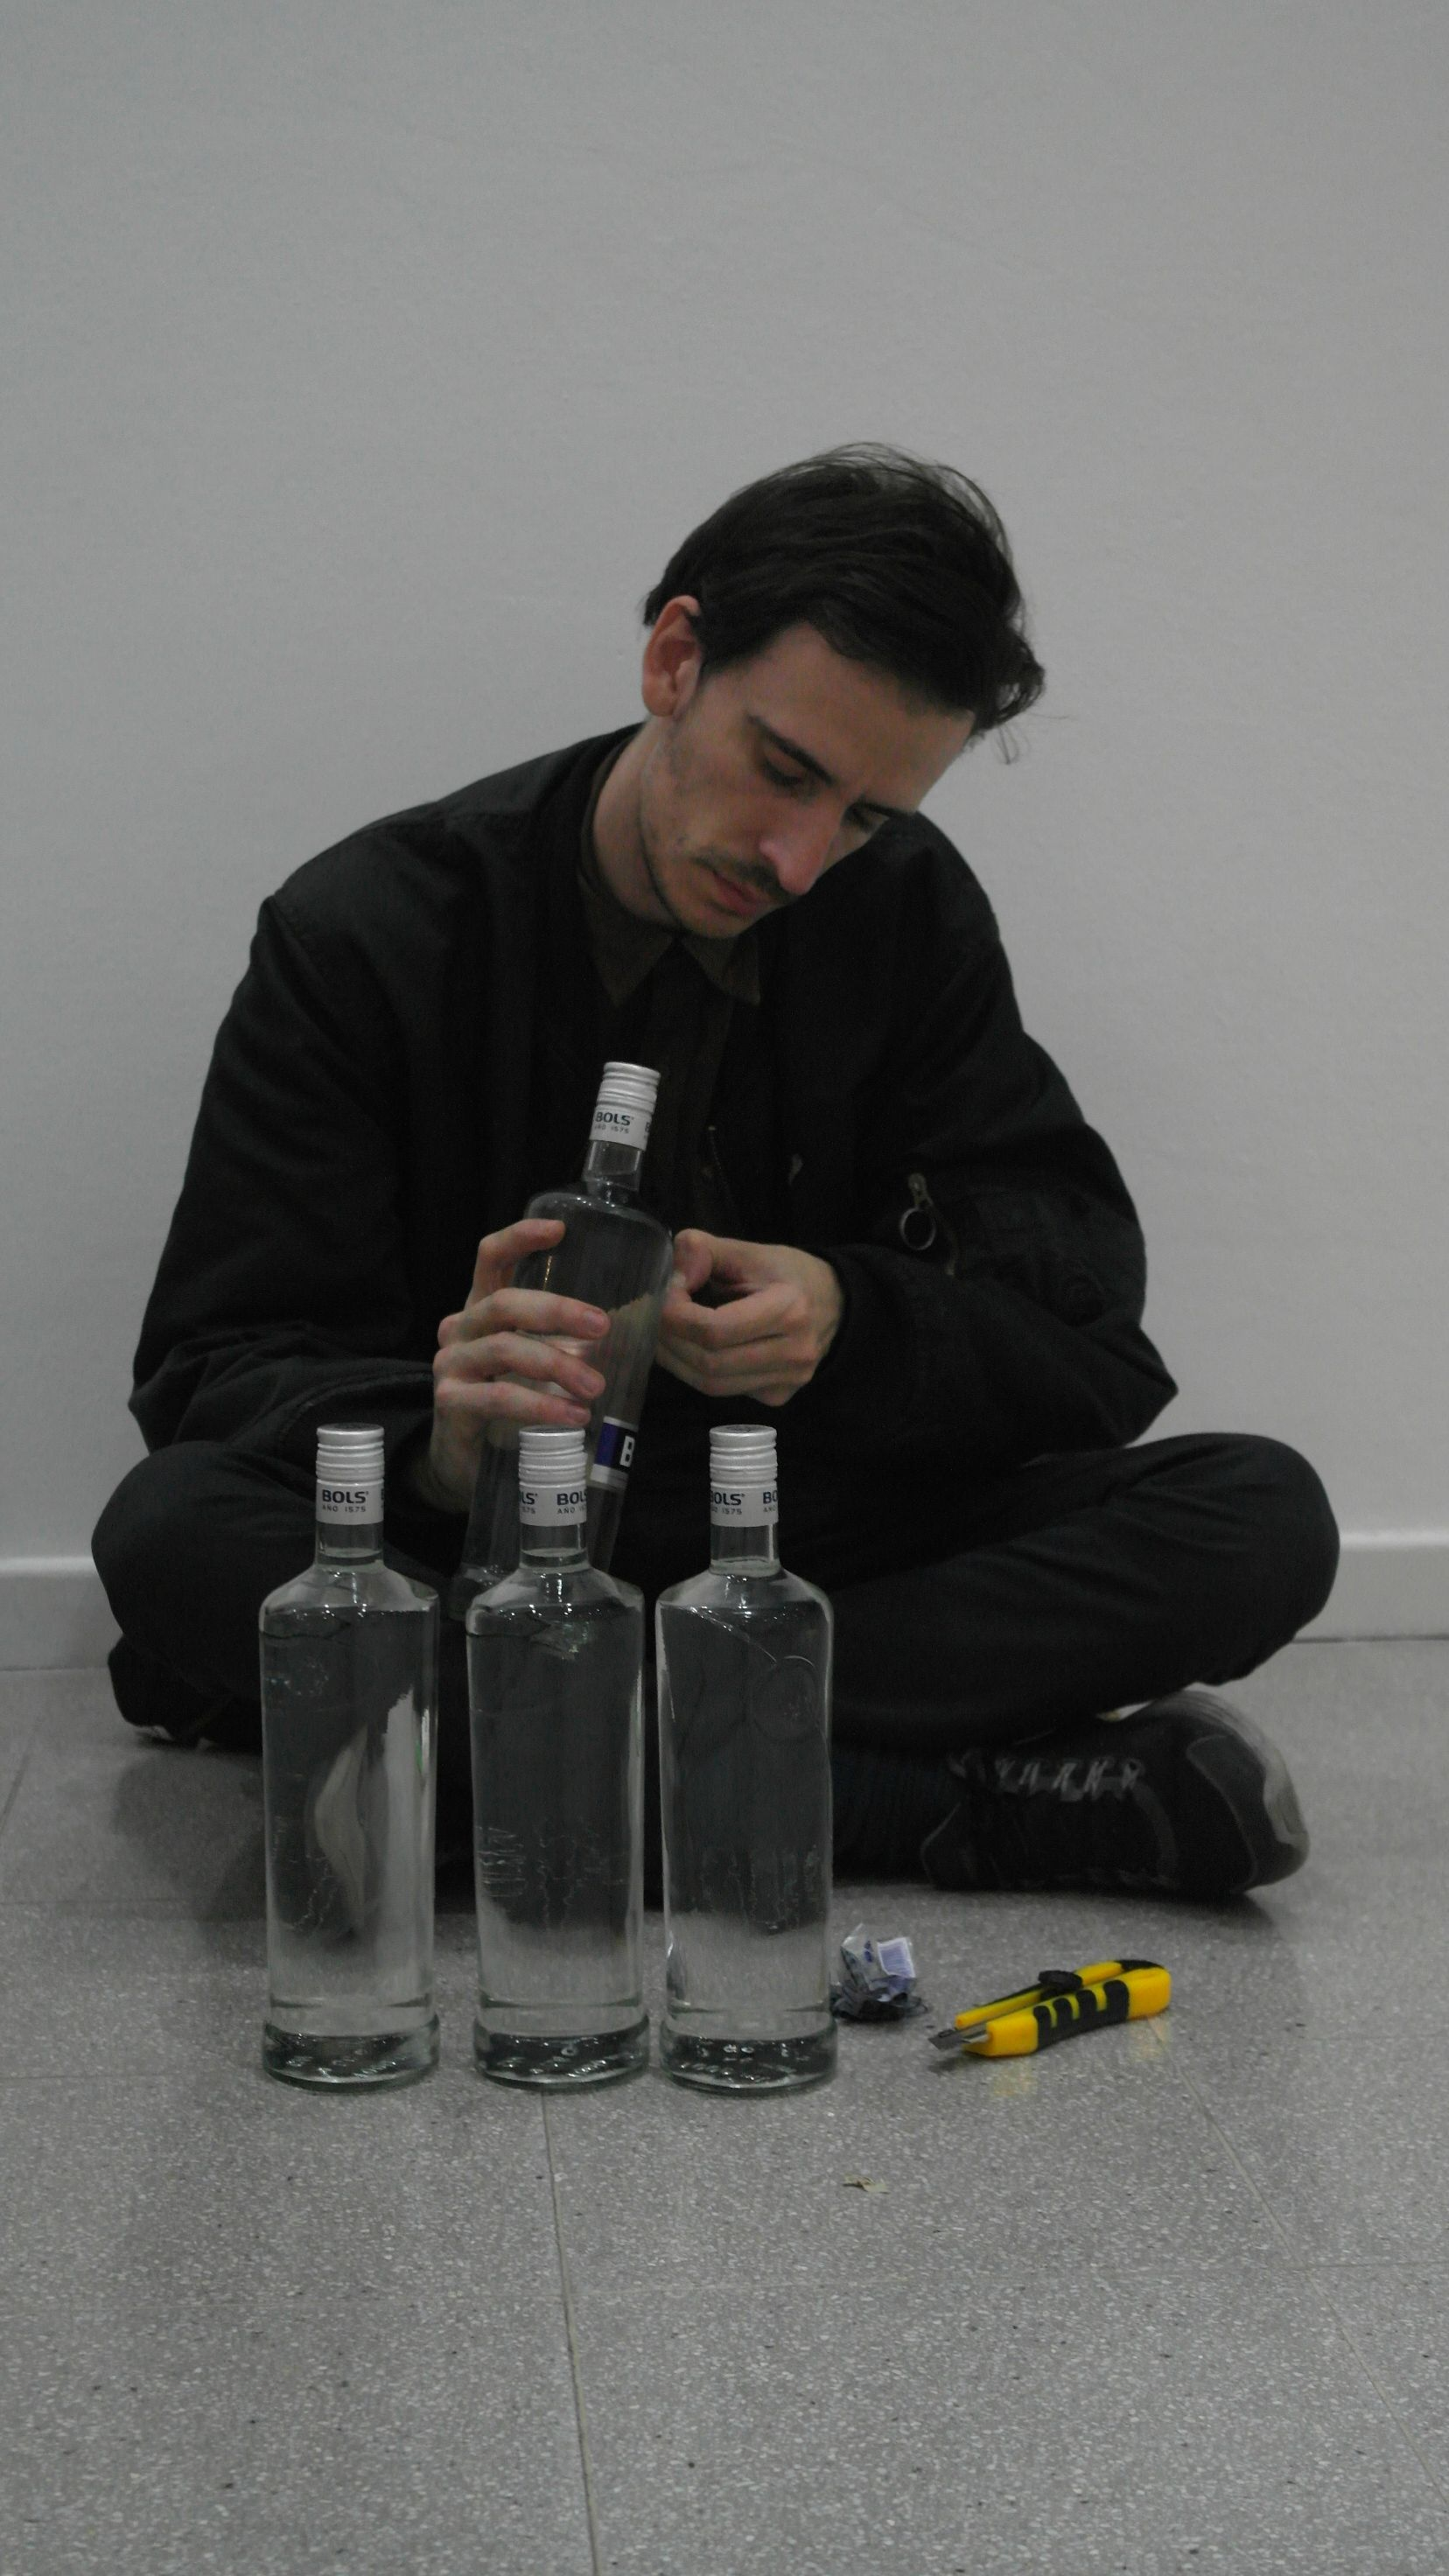 Bruno Gruppali en montaje. http://museosdeartebahiablanca.blogspot.com.ar/2014/05/bra2014-en-montaje.html